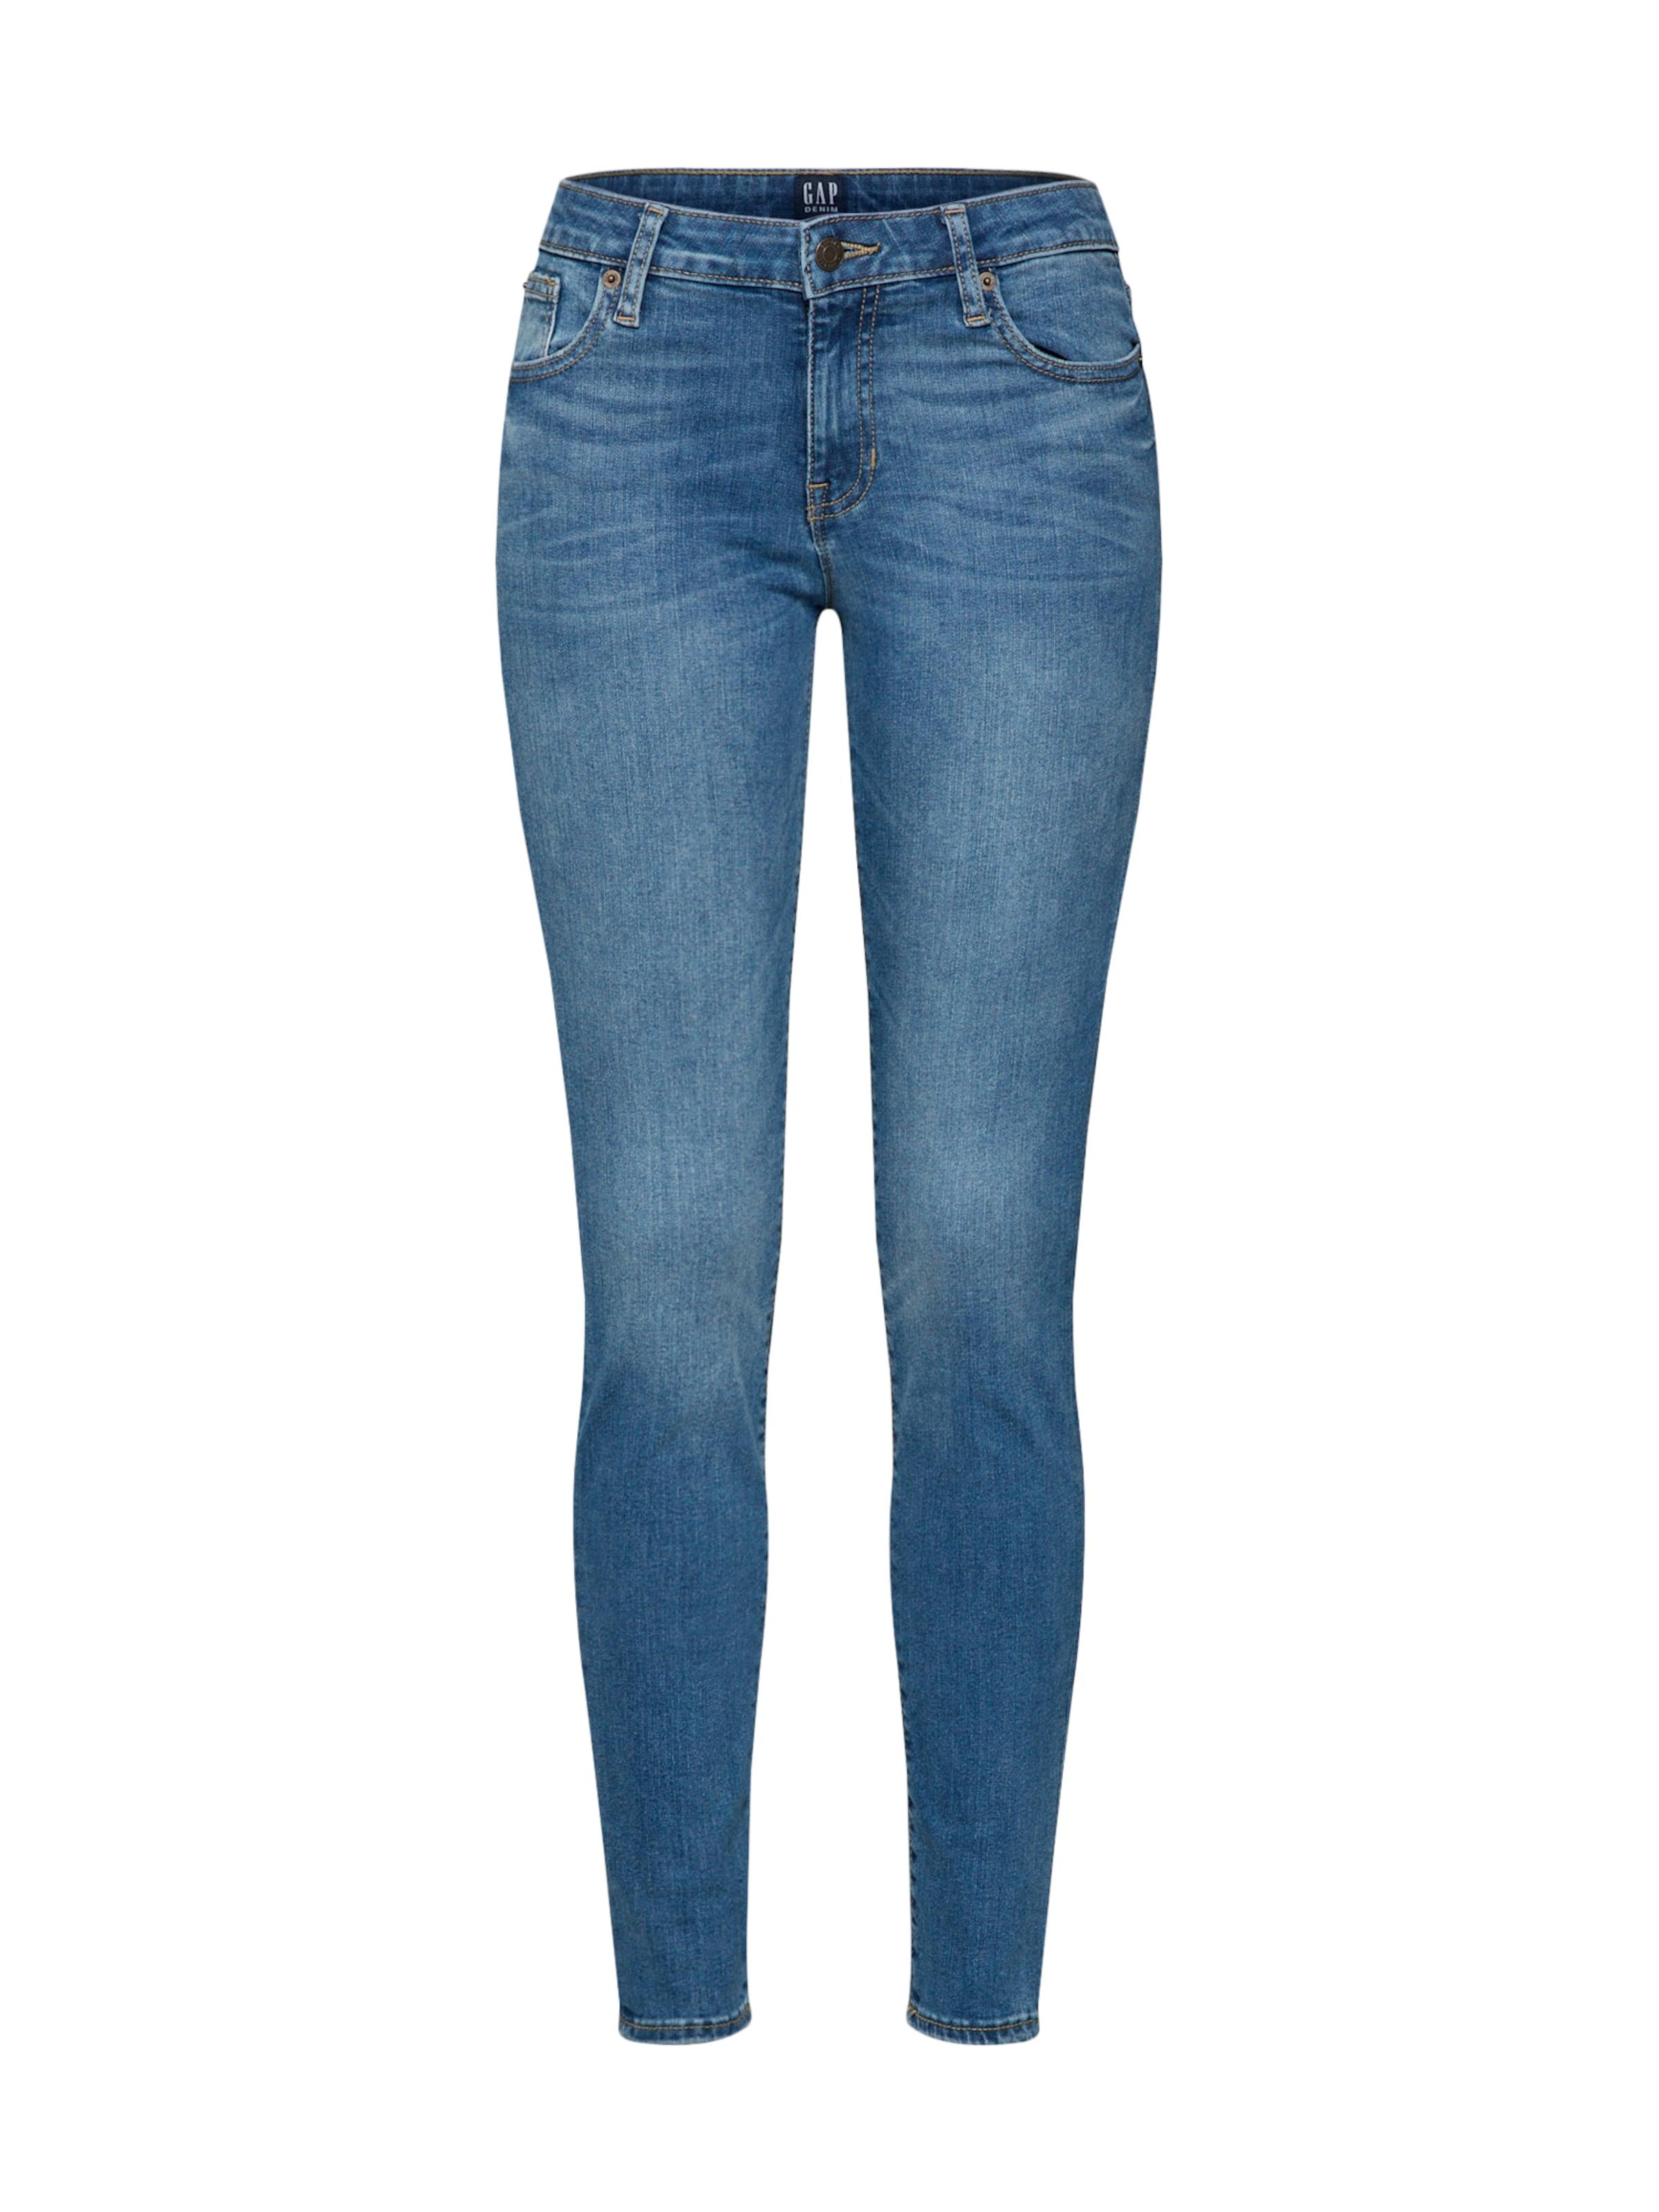 Jeans Jeans In Denim Blue Blue Gap Denim In Gap n0PNk8OXw